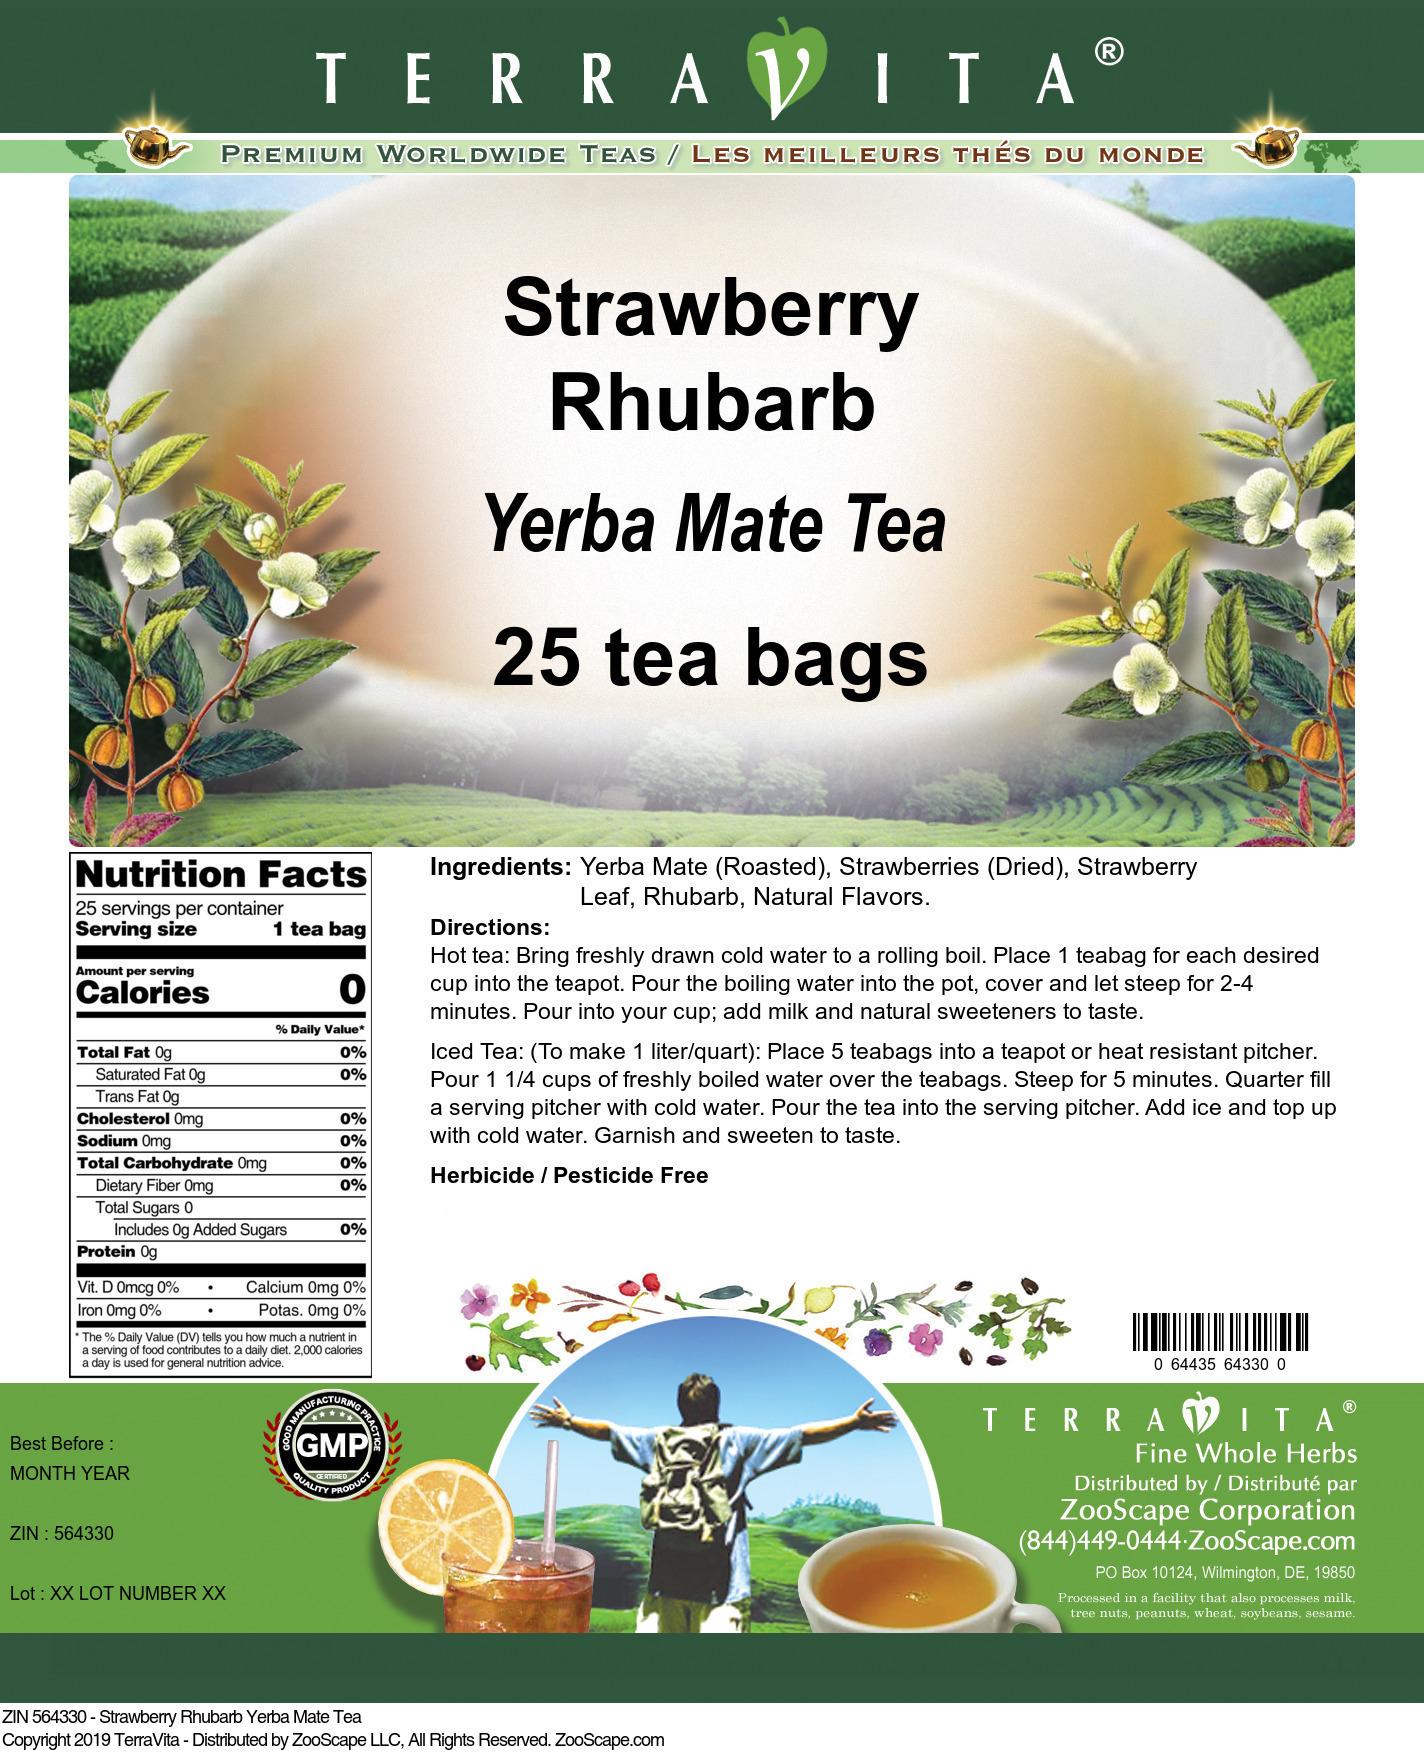 Strawberry Rhubarb Yerba Mate Tea